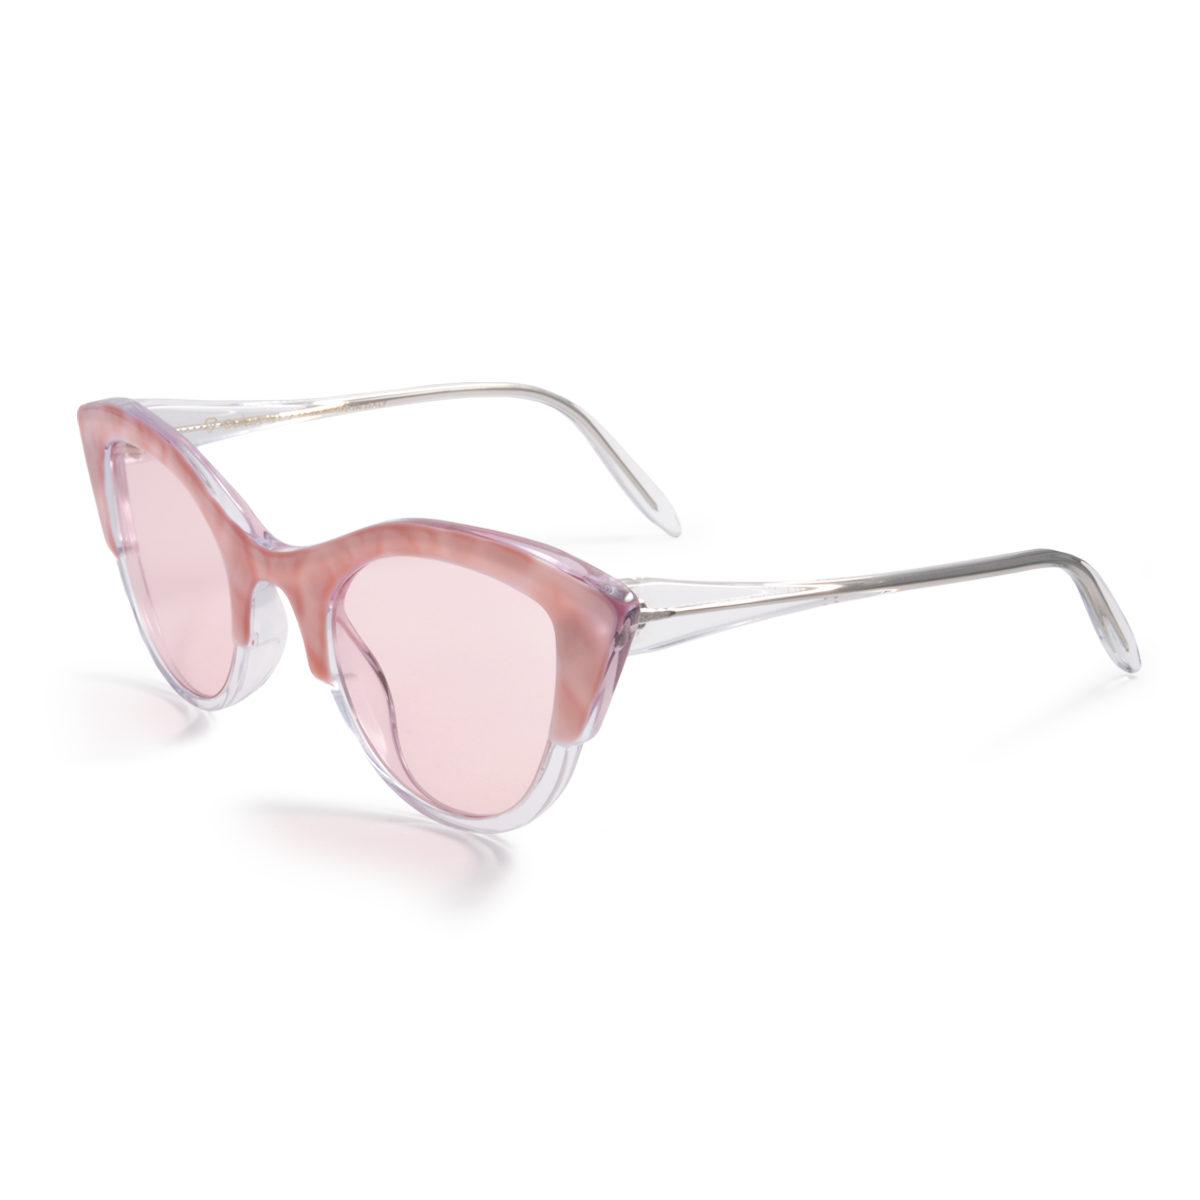 Mayreau pink